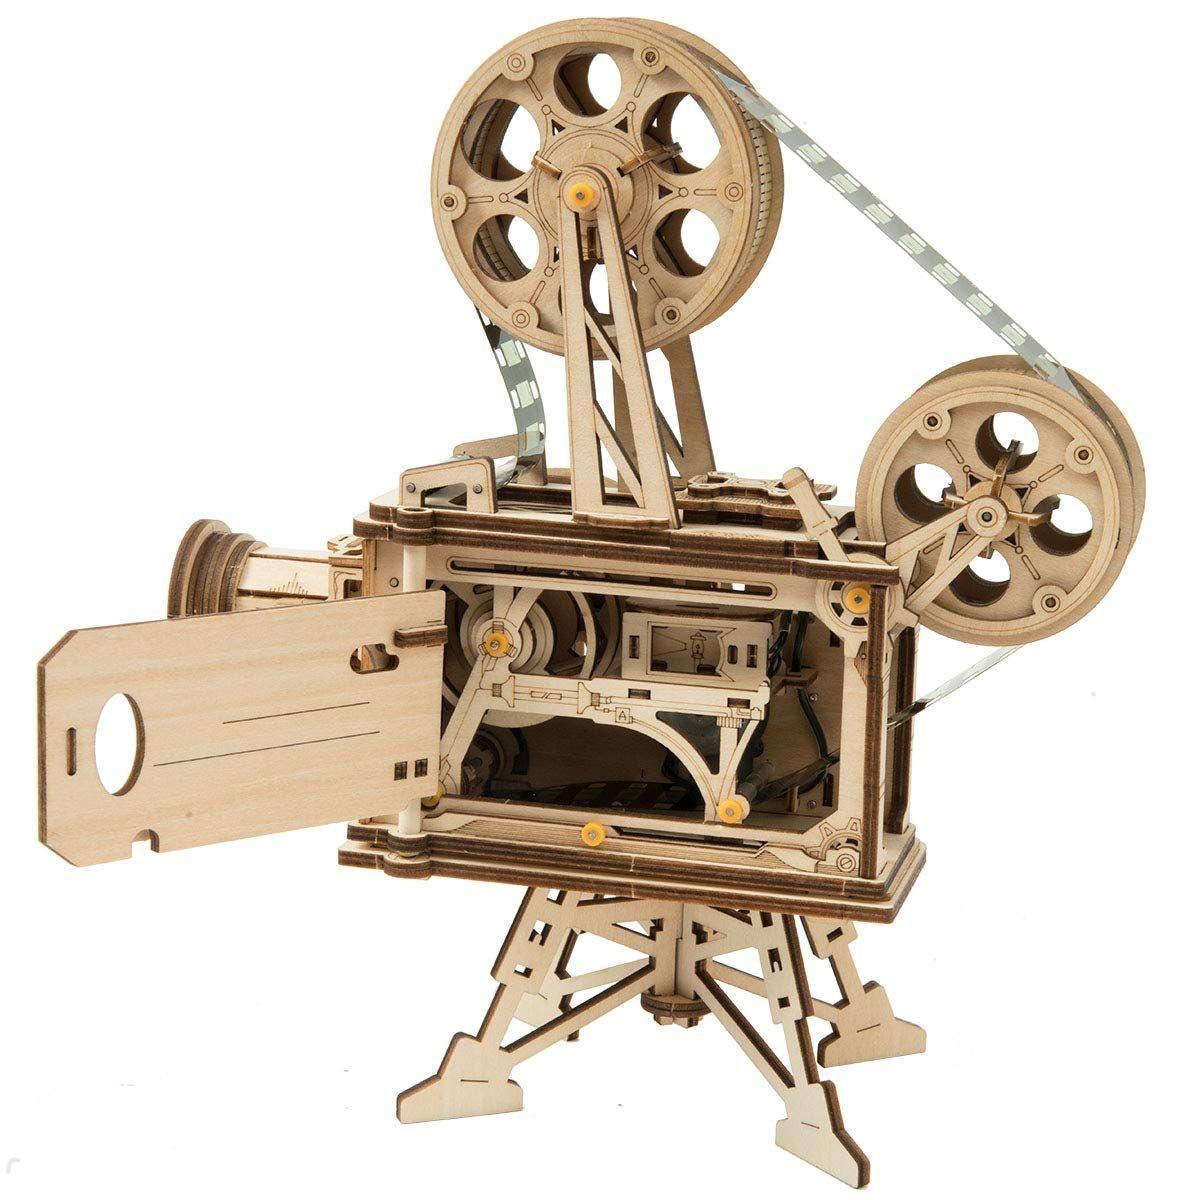 ROBOTIME Vitascope Kit Wooden Puzzle